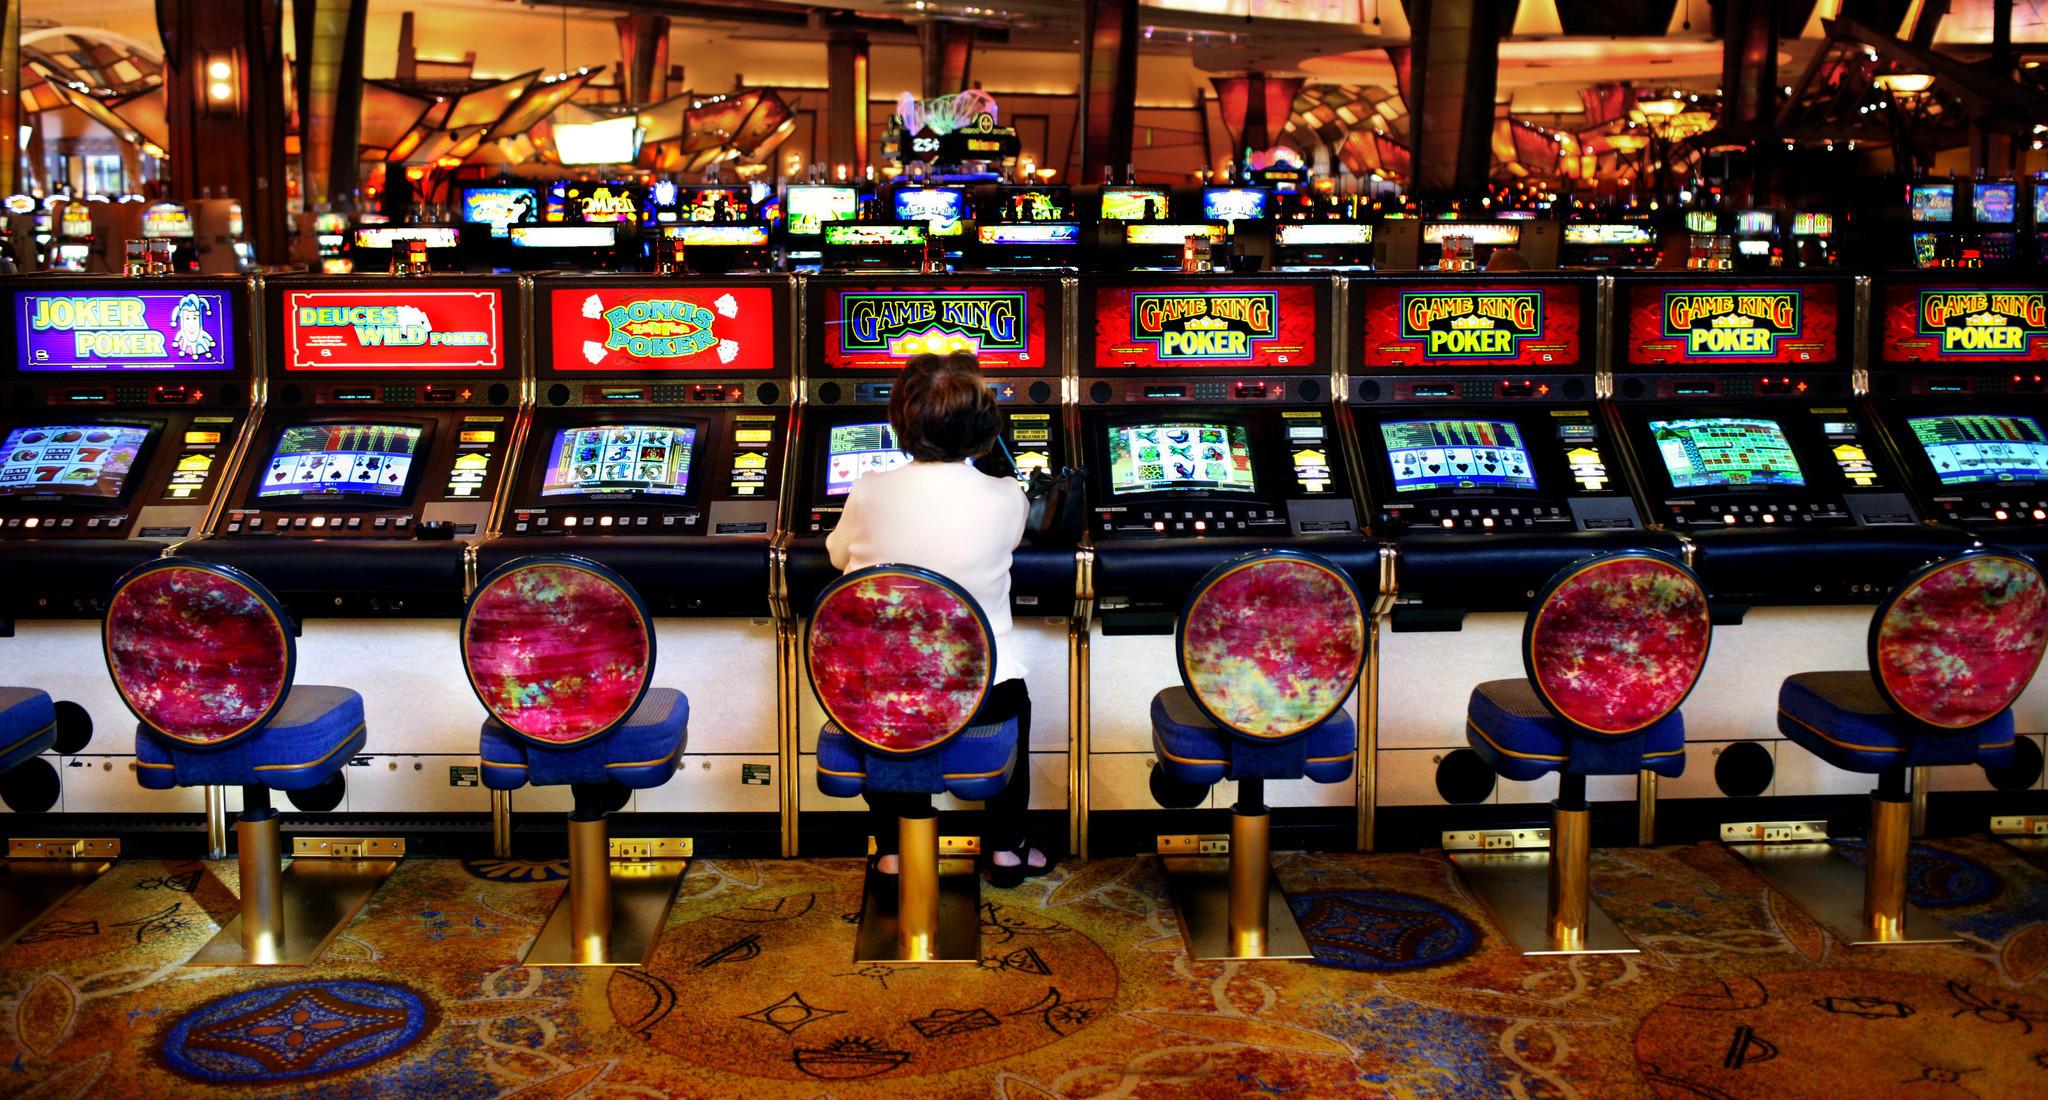 Casino in franklin ct indian gaming casino fresno ca